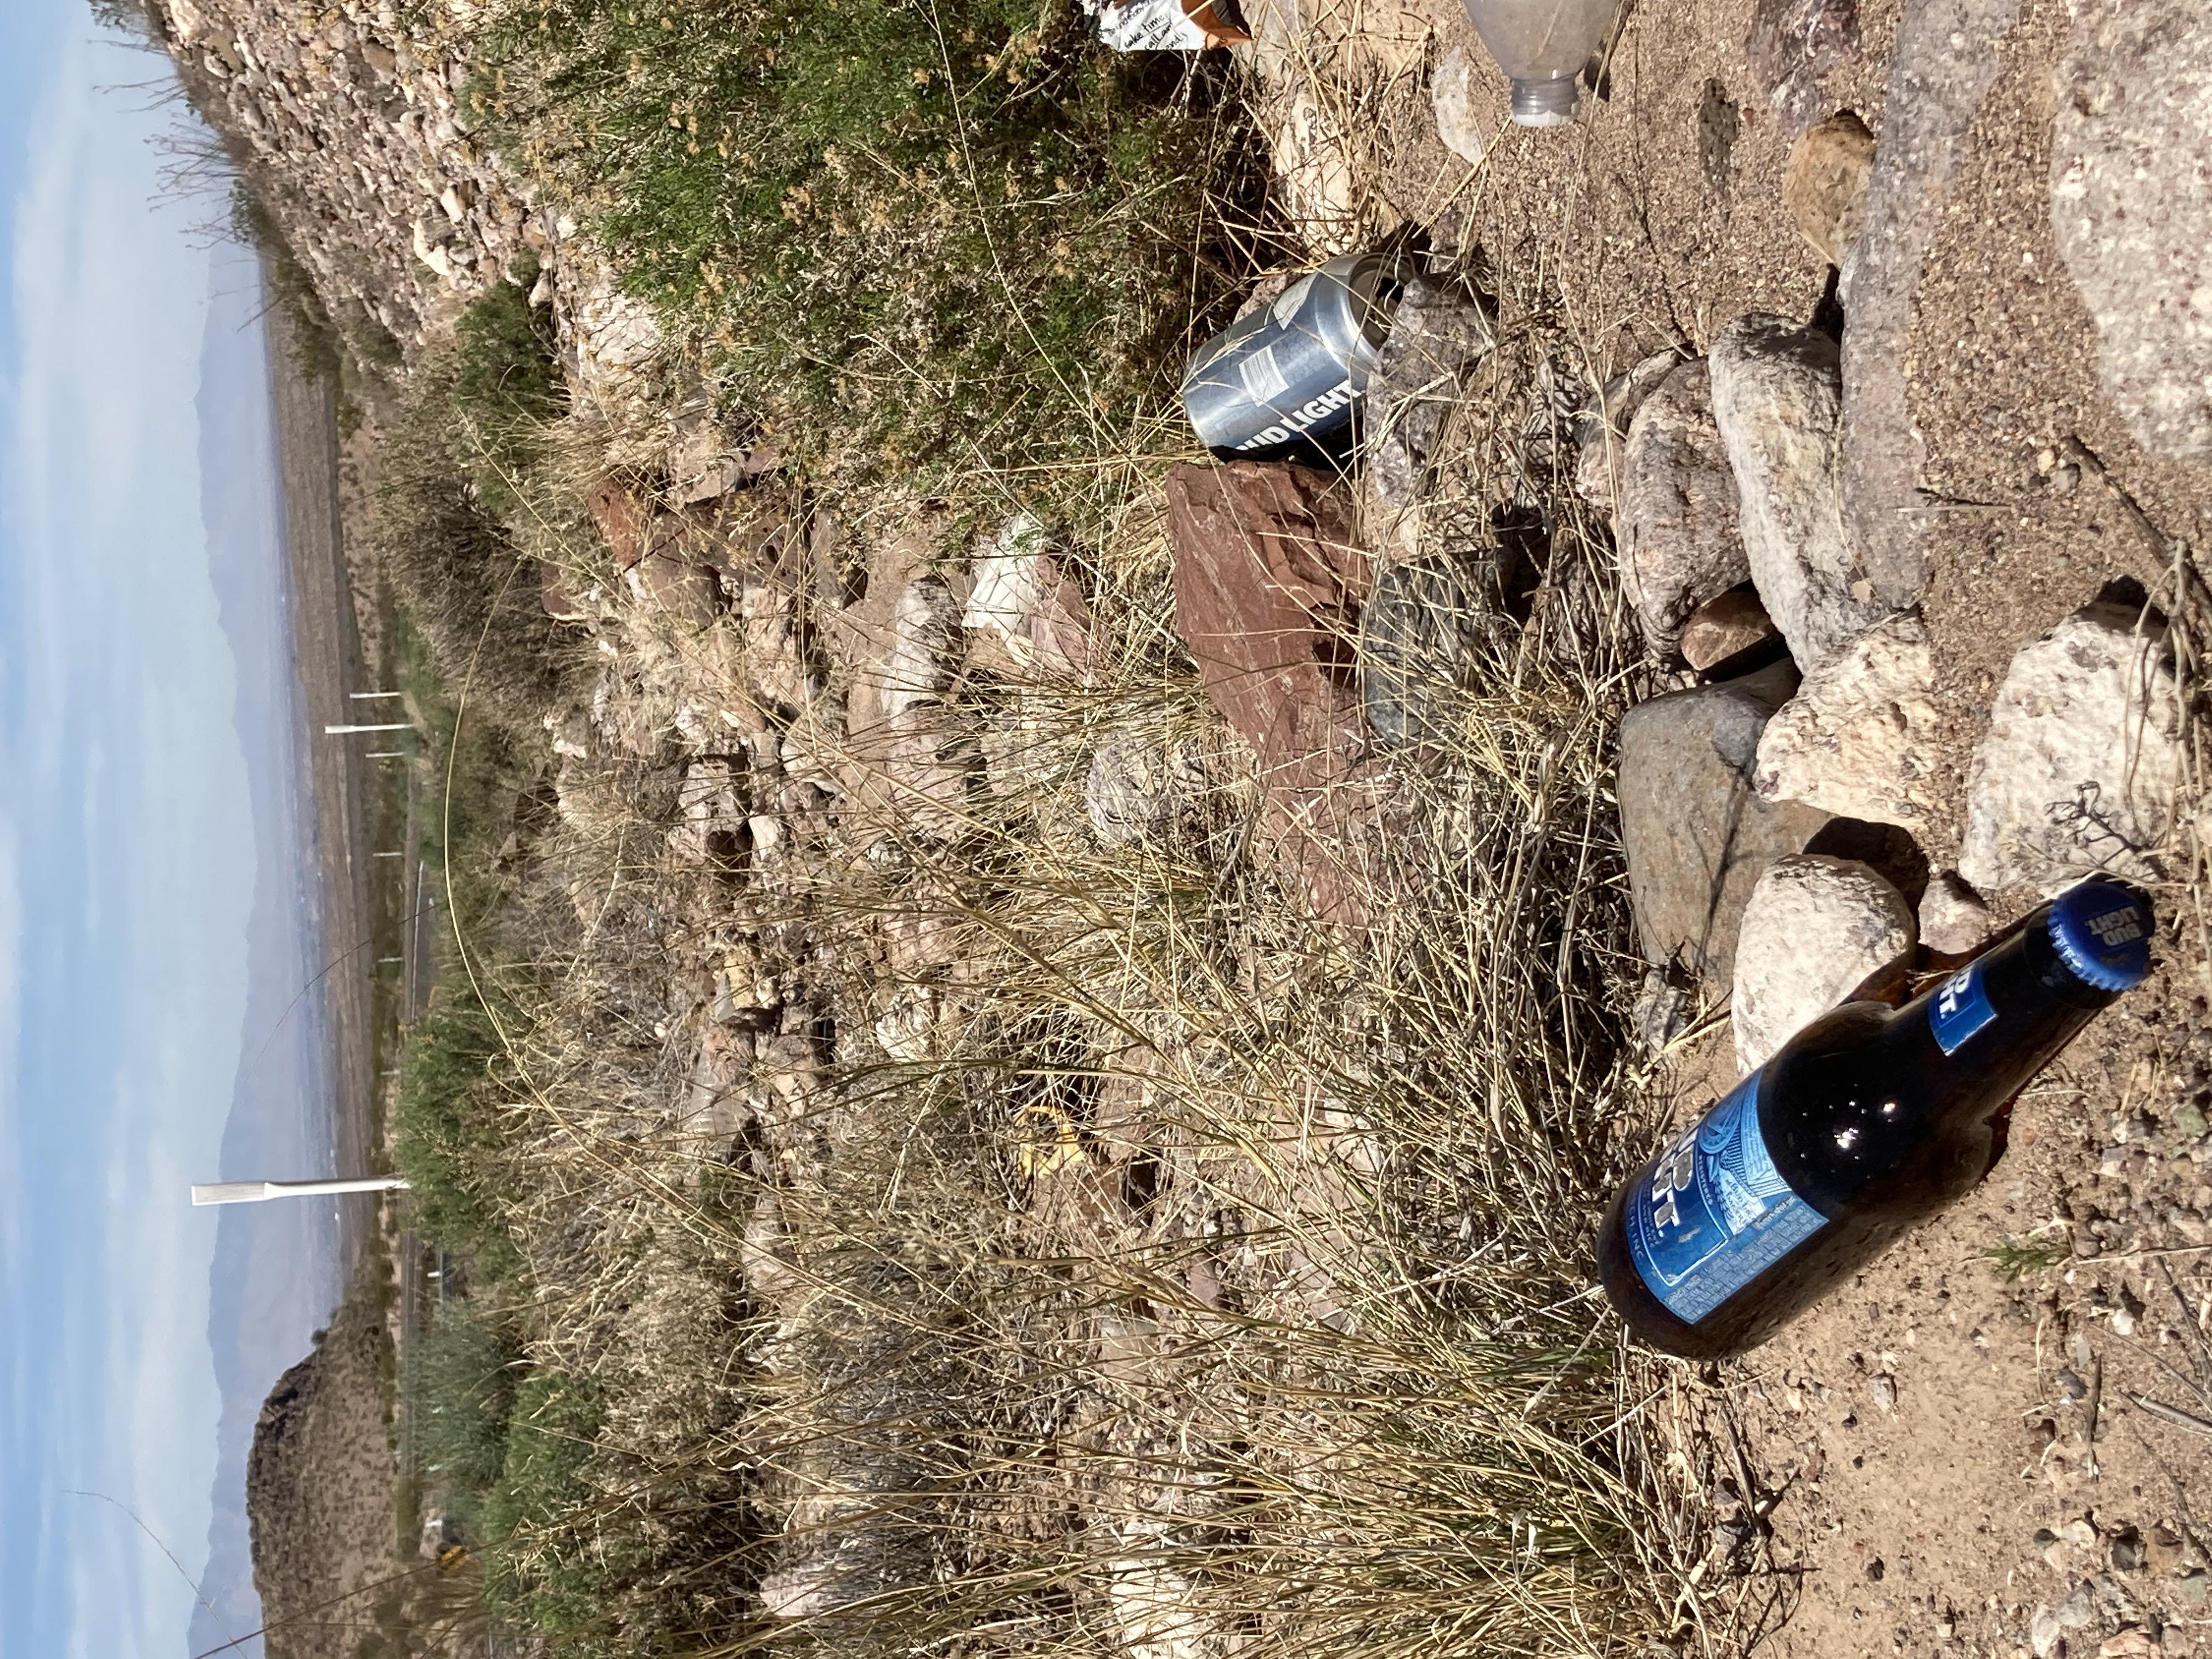 Adopt a Highway US 191 trash Safford scenery